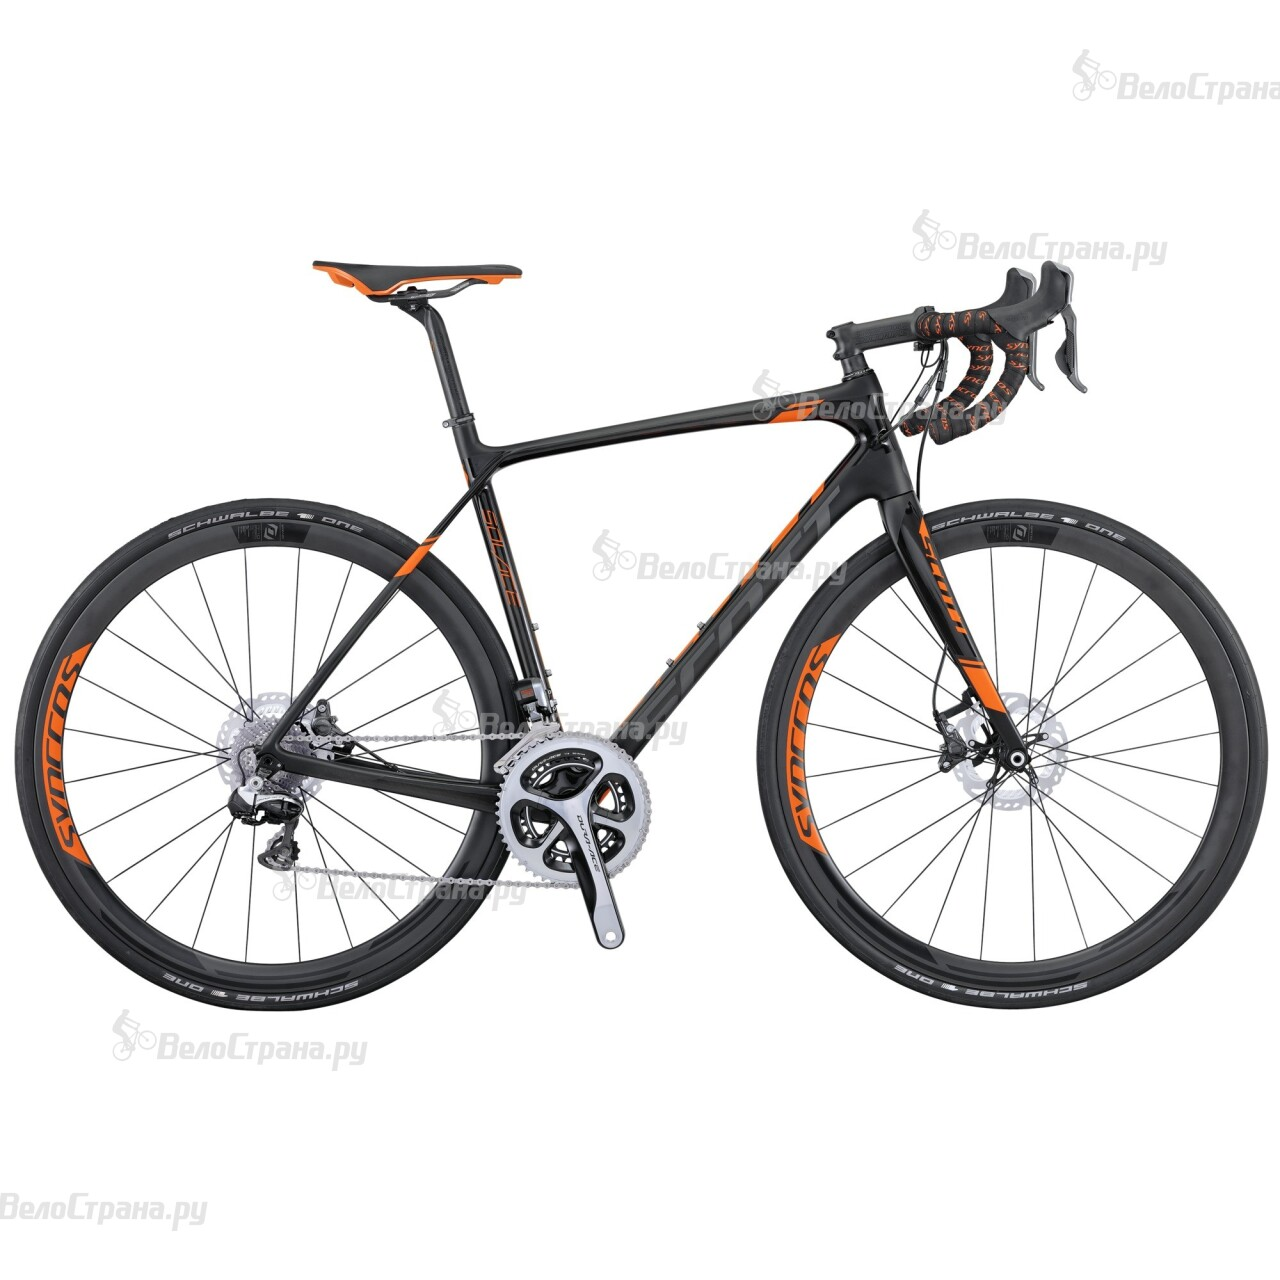 Велосипед Scott Solace Premium Disc (2016) велосипед scott contessa solace 15 disc 2017